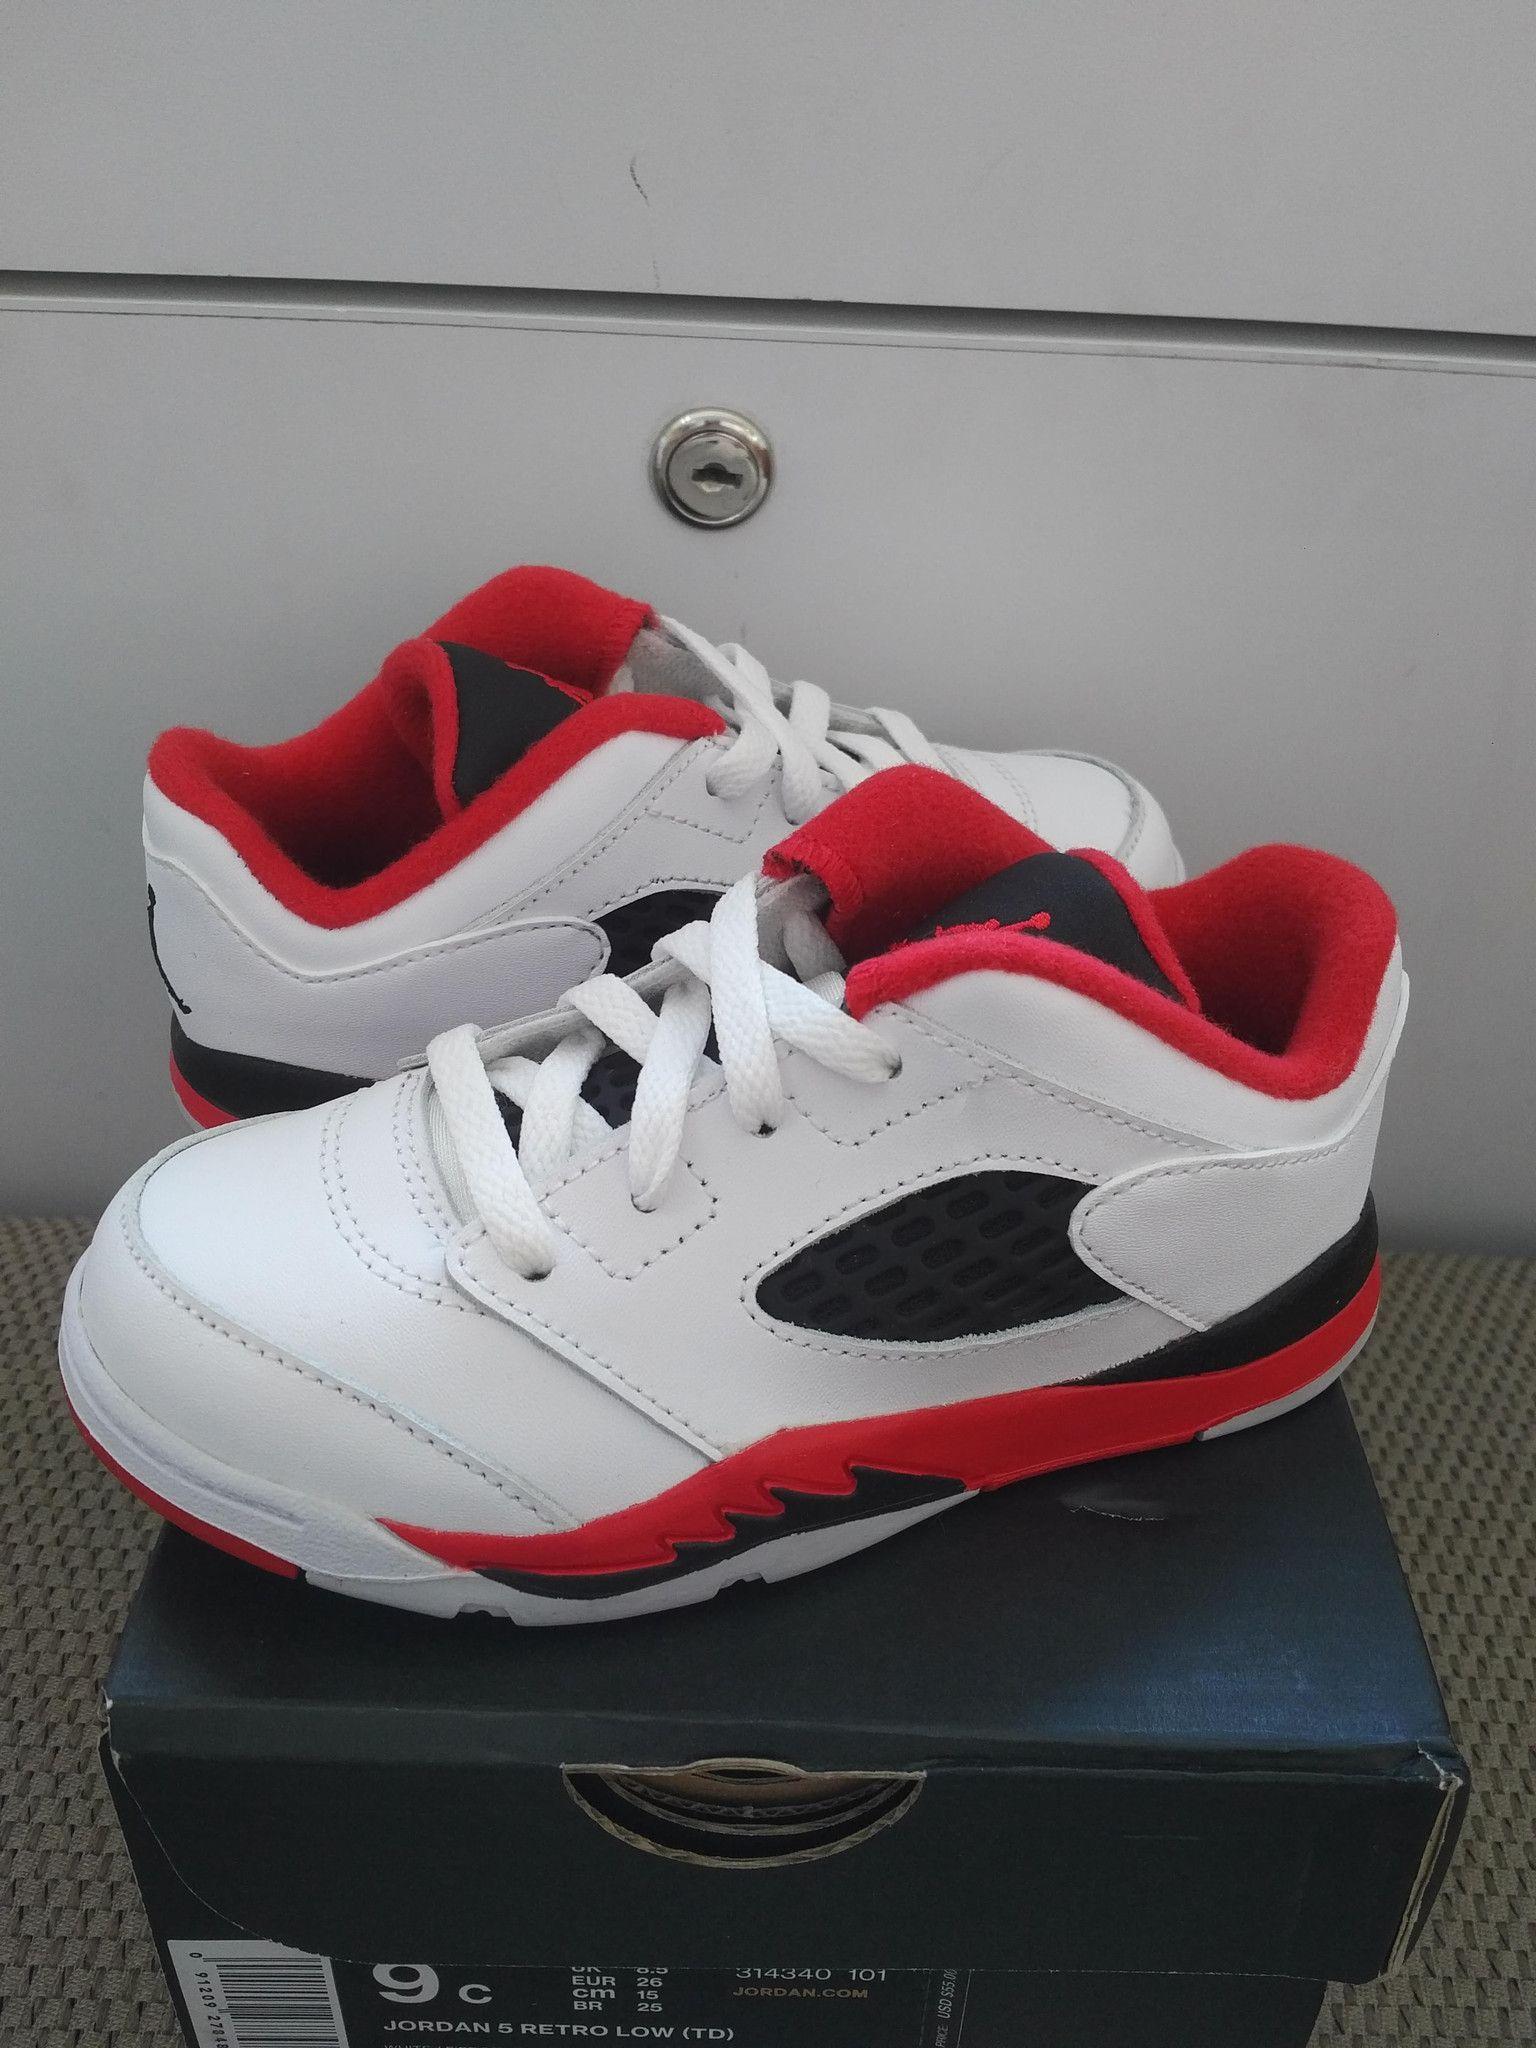 Air Jordan 5 Retro low (TD) Toddler TD Baby White Fire Red Black 314340-101 c4a7c98cd